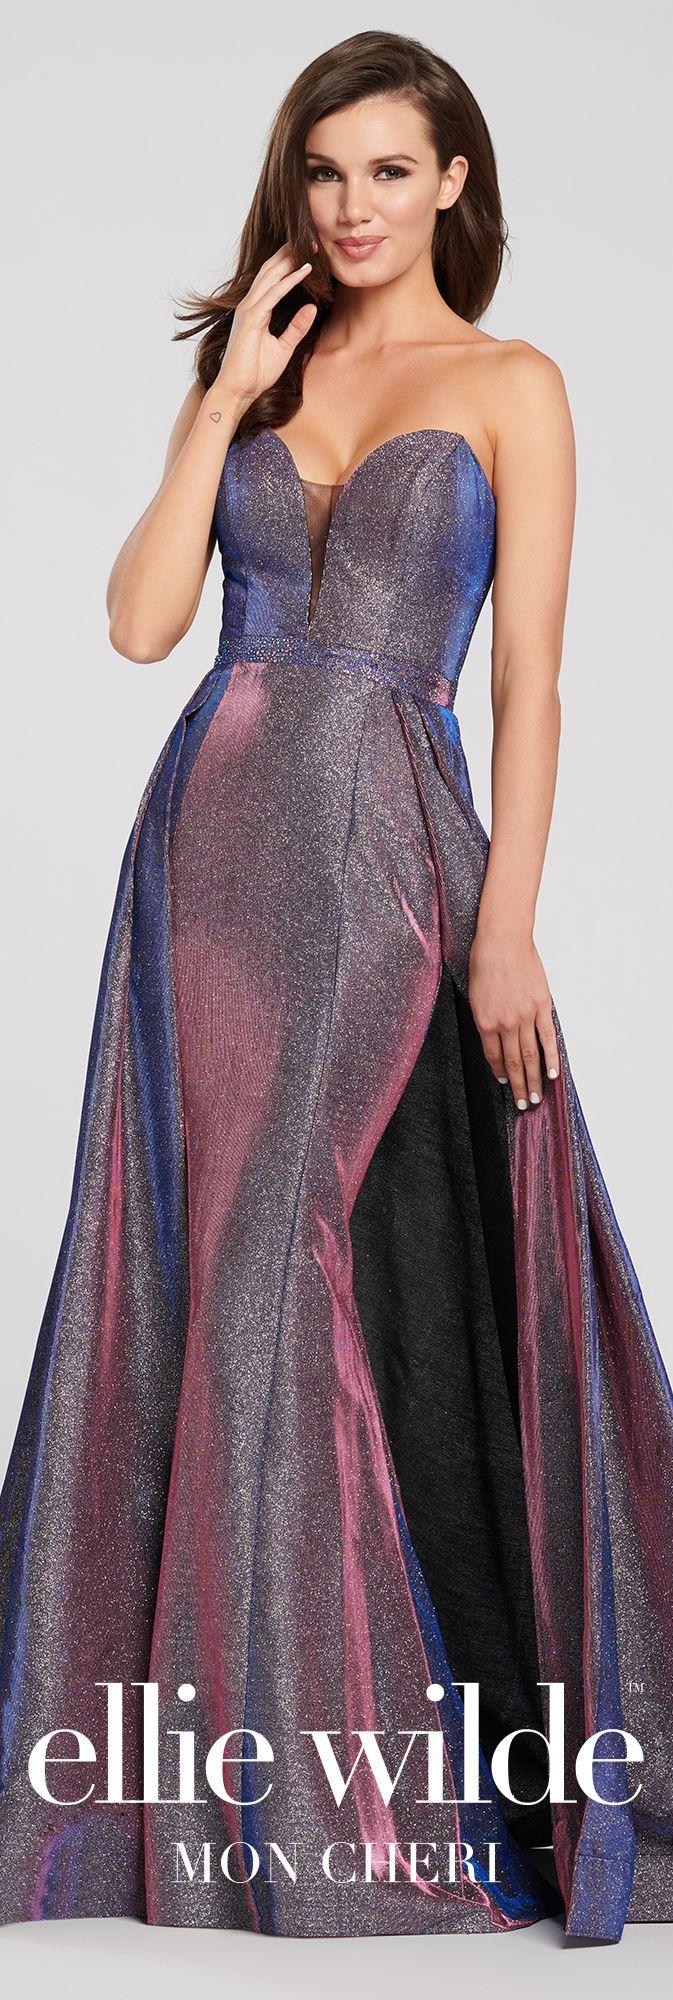 a2958f712e Strapless Novelty Stretch Glitter Fit   Flare Prom Dress- EW119065 in 2019